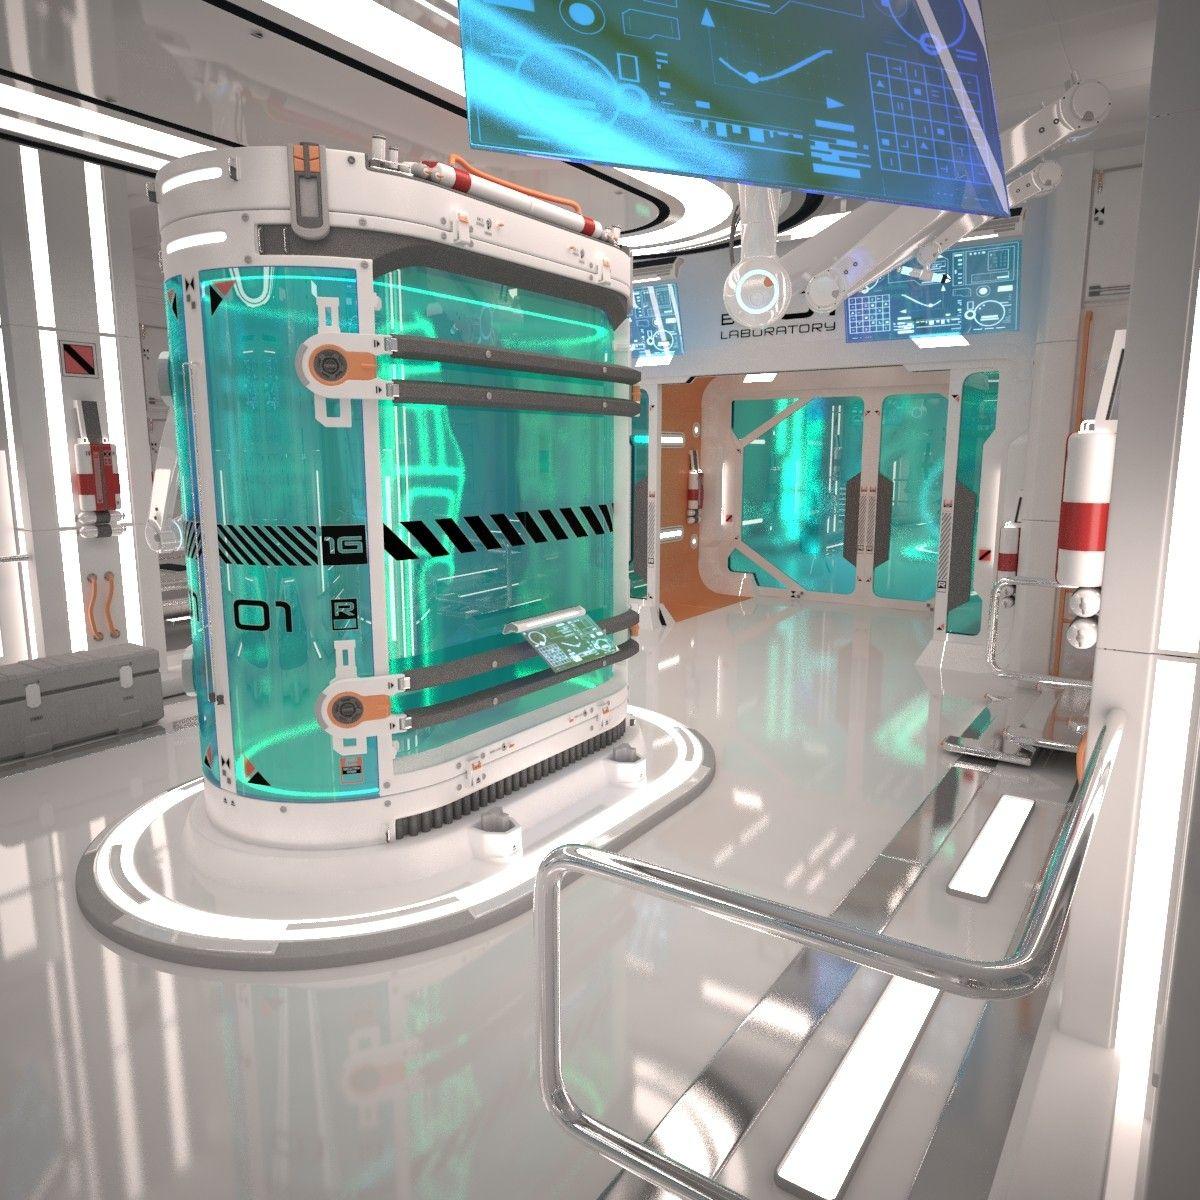 Strange Pin By Conthemon On Design In 2019 Spaceship Interior Download Free Architecture Designs Scobabritishbridgeorg